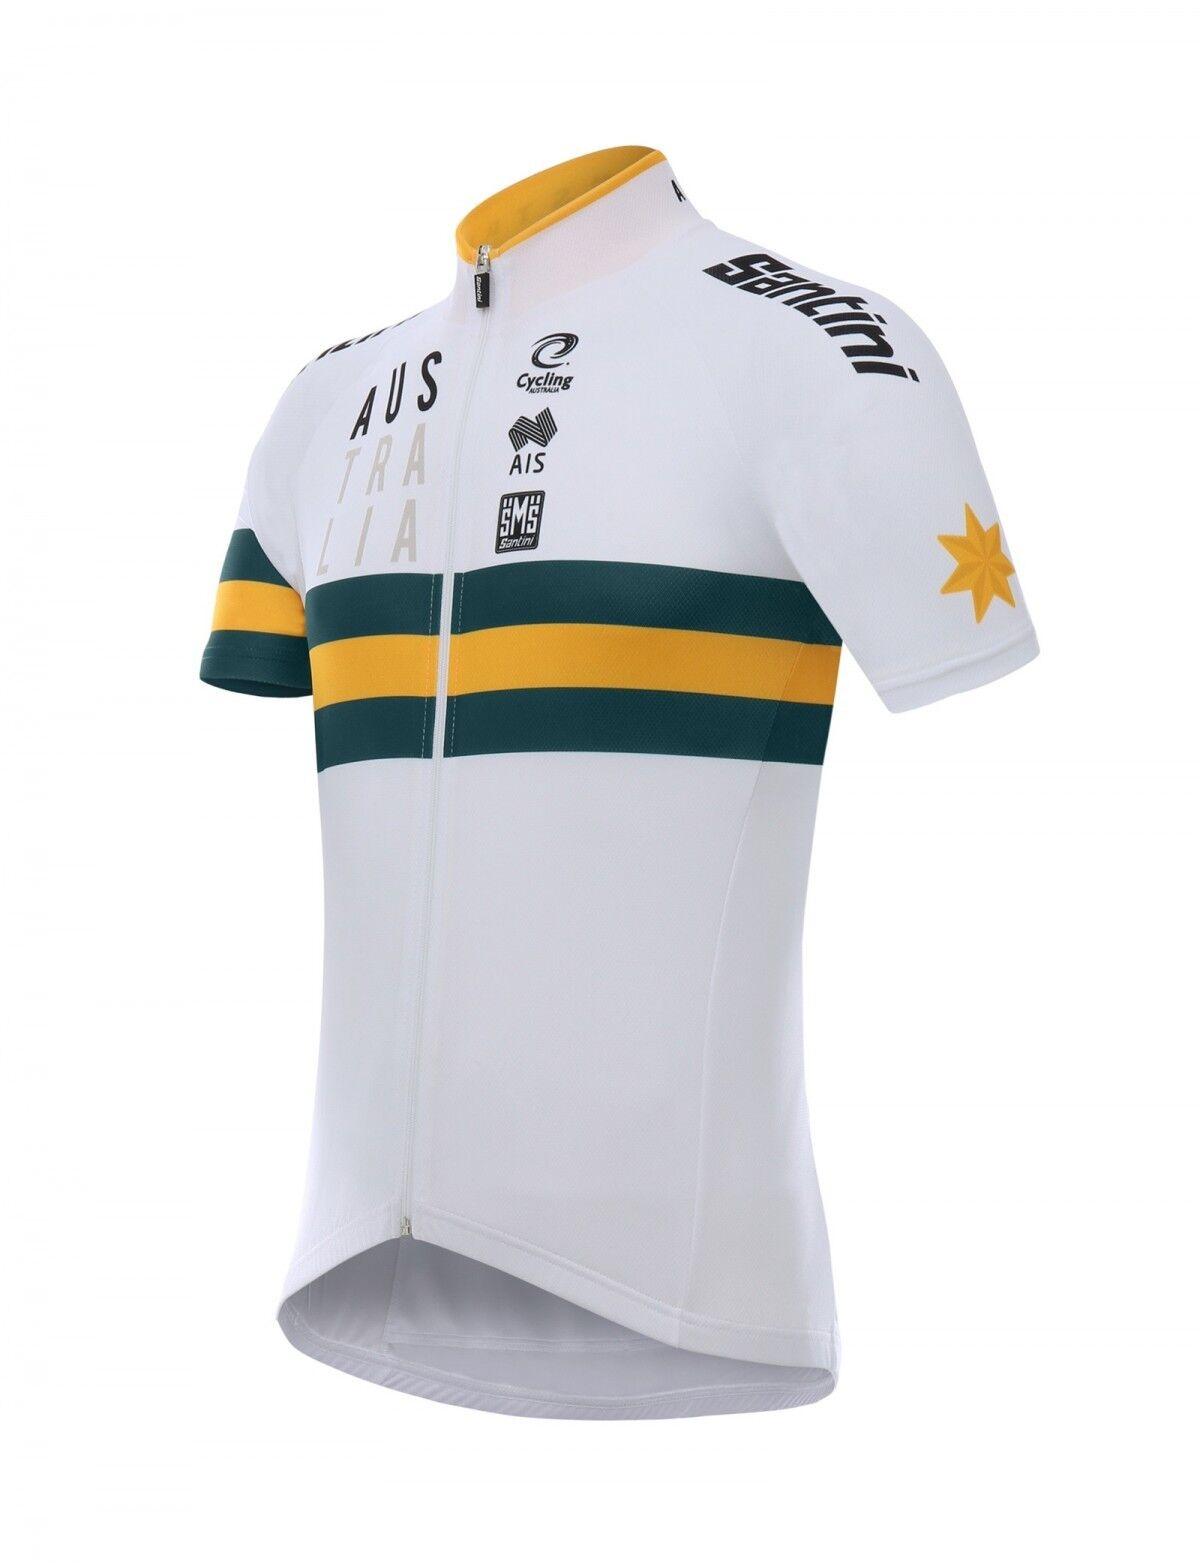 201718  Men's  AUSTRALIA NAT'L TEAM Short Sleeve Cycling Jersey by Santini